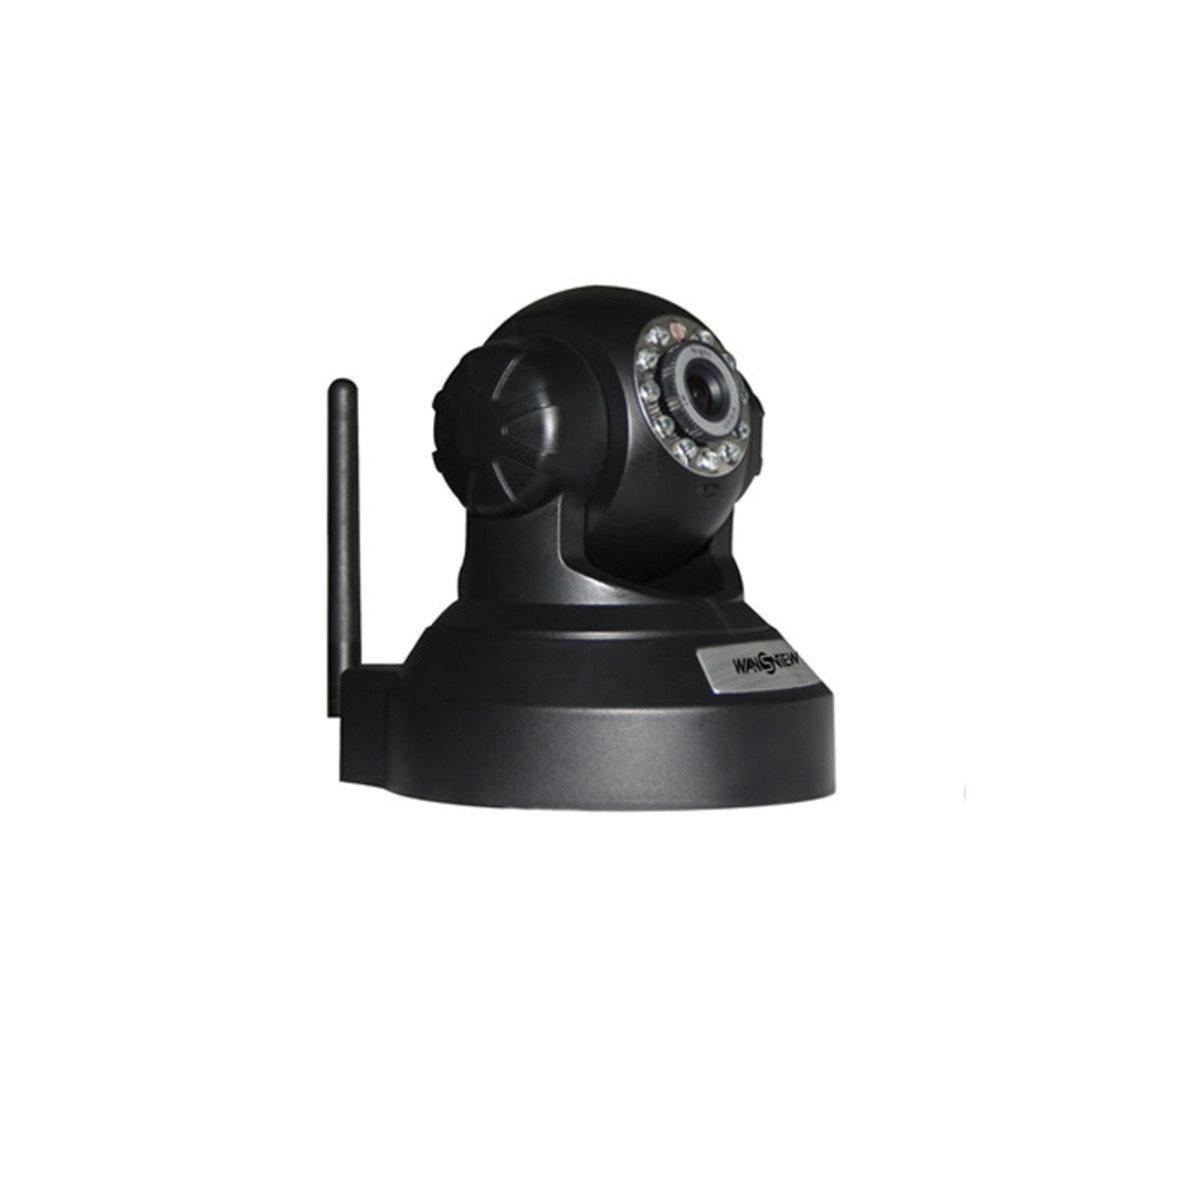 720p 高清旋轉式多角度無線網路攝影機 NCM630GB 黑色